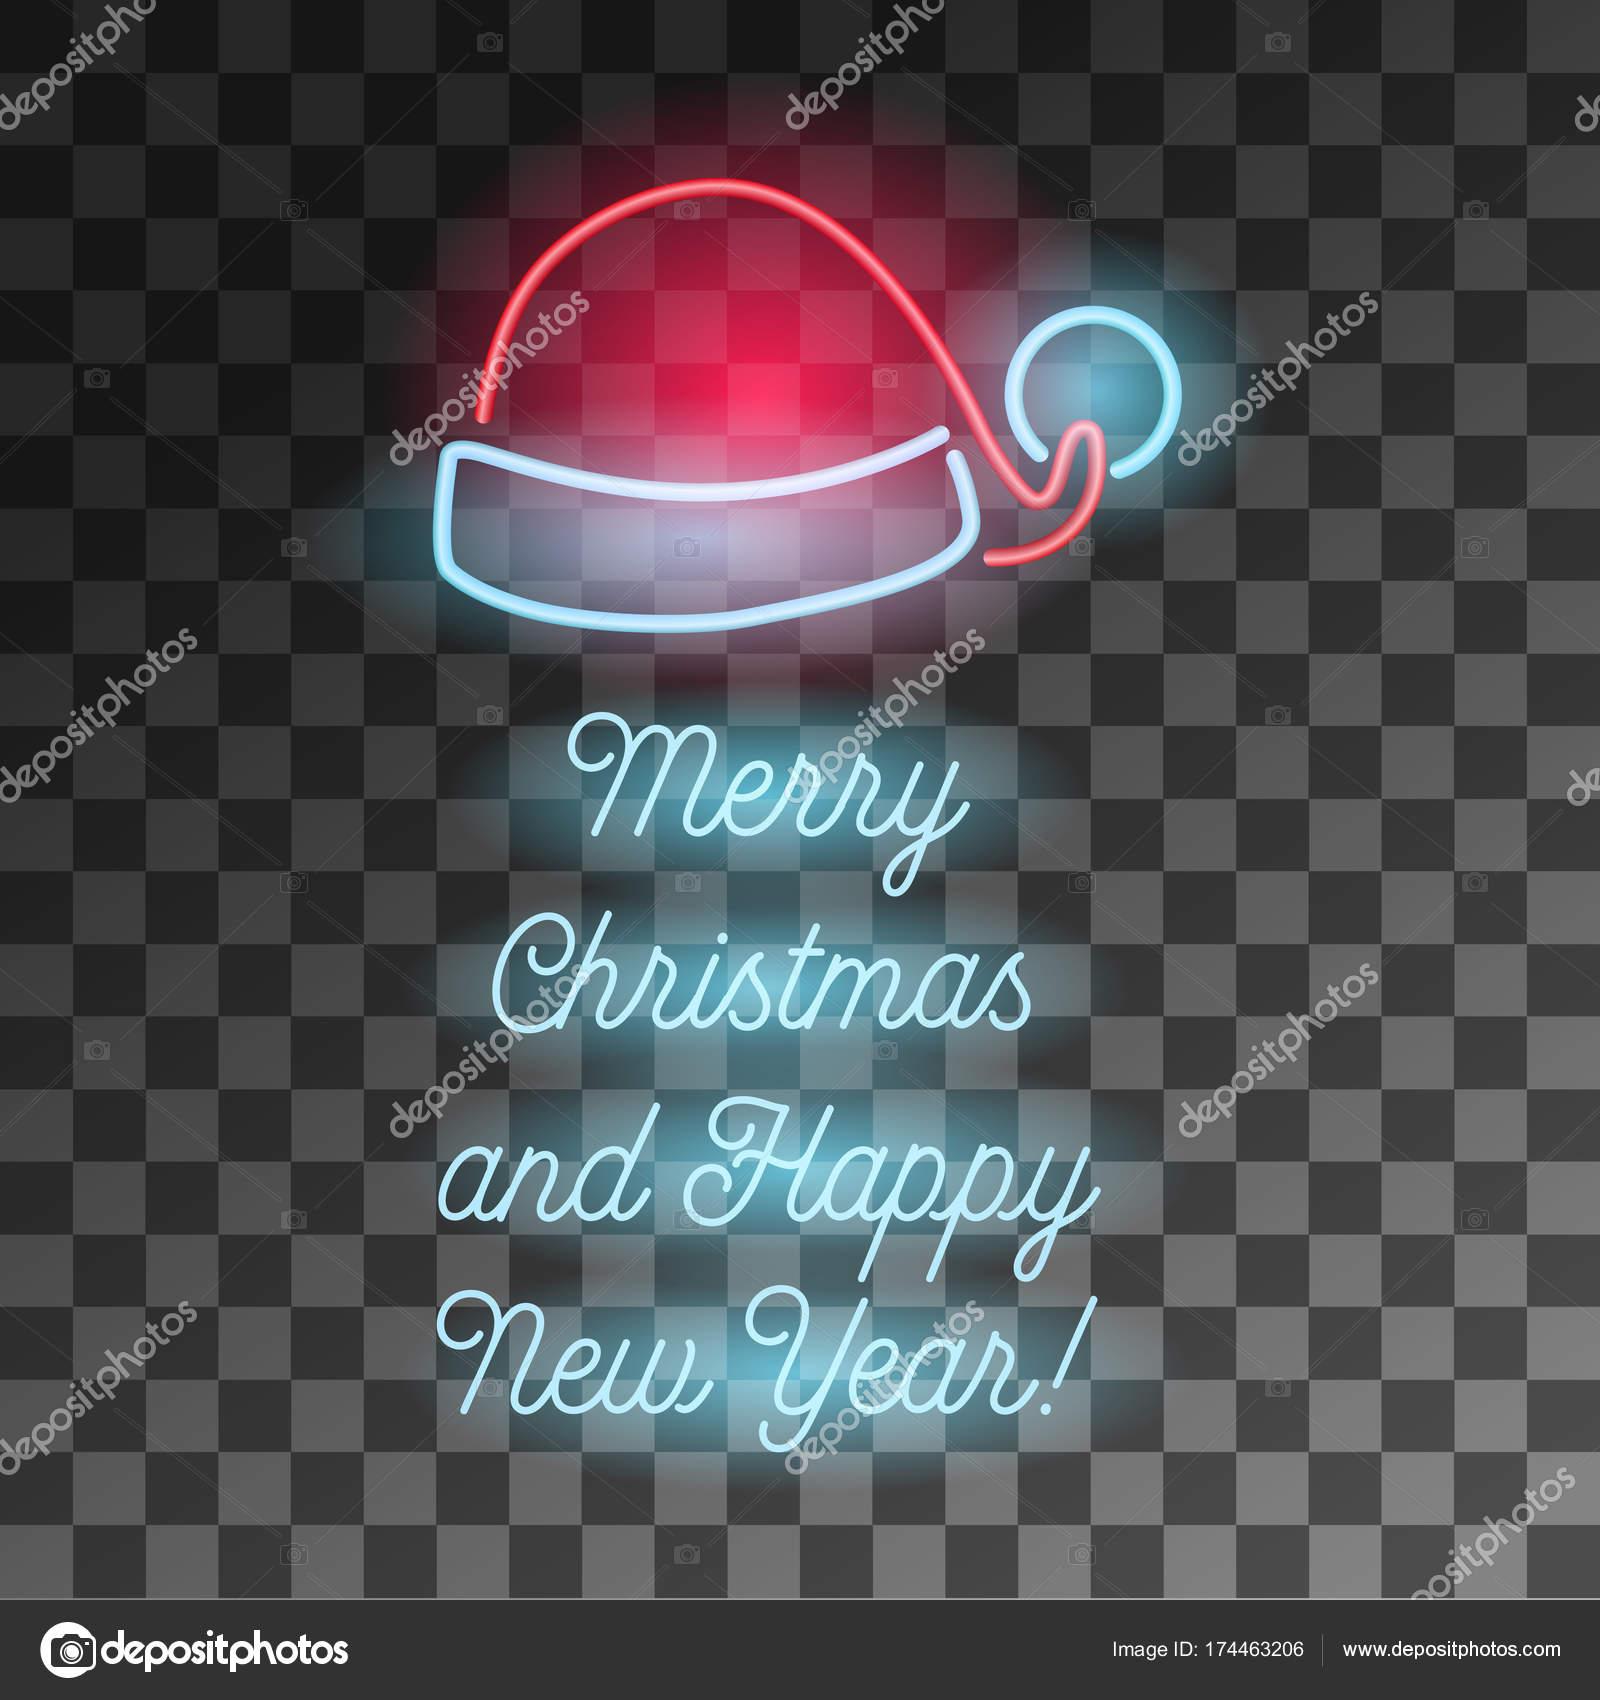 depositphotos 174463206 stock illustration neon merry christmas and happy